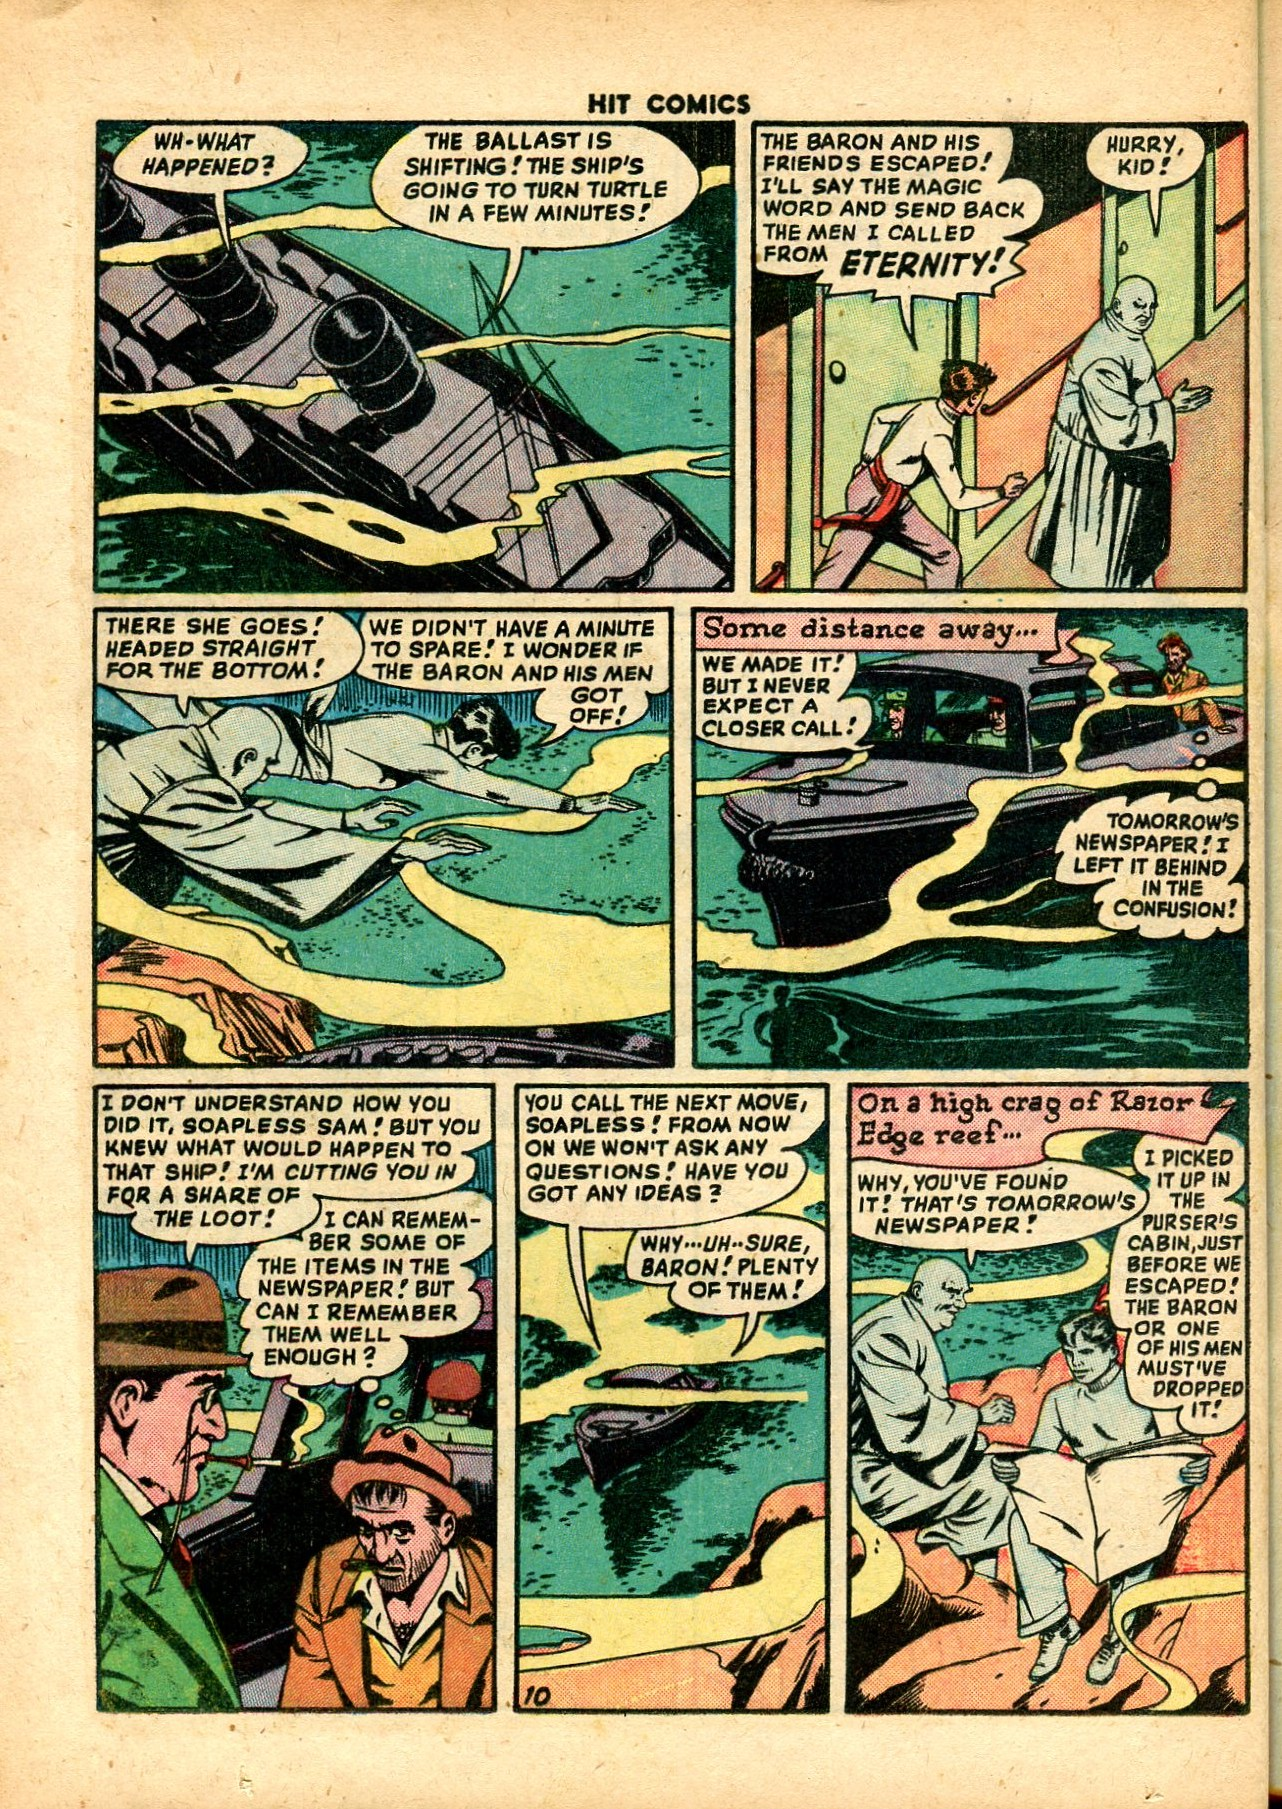 Read online Hit Comics comic -  Issue #59 - 12